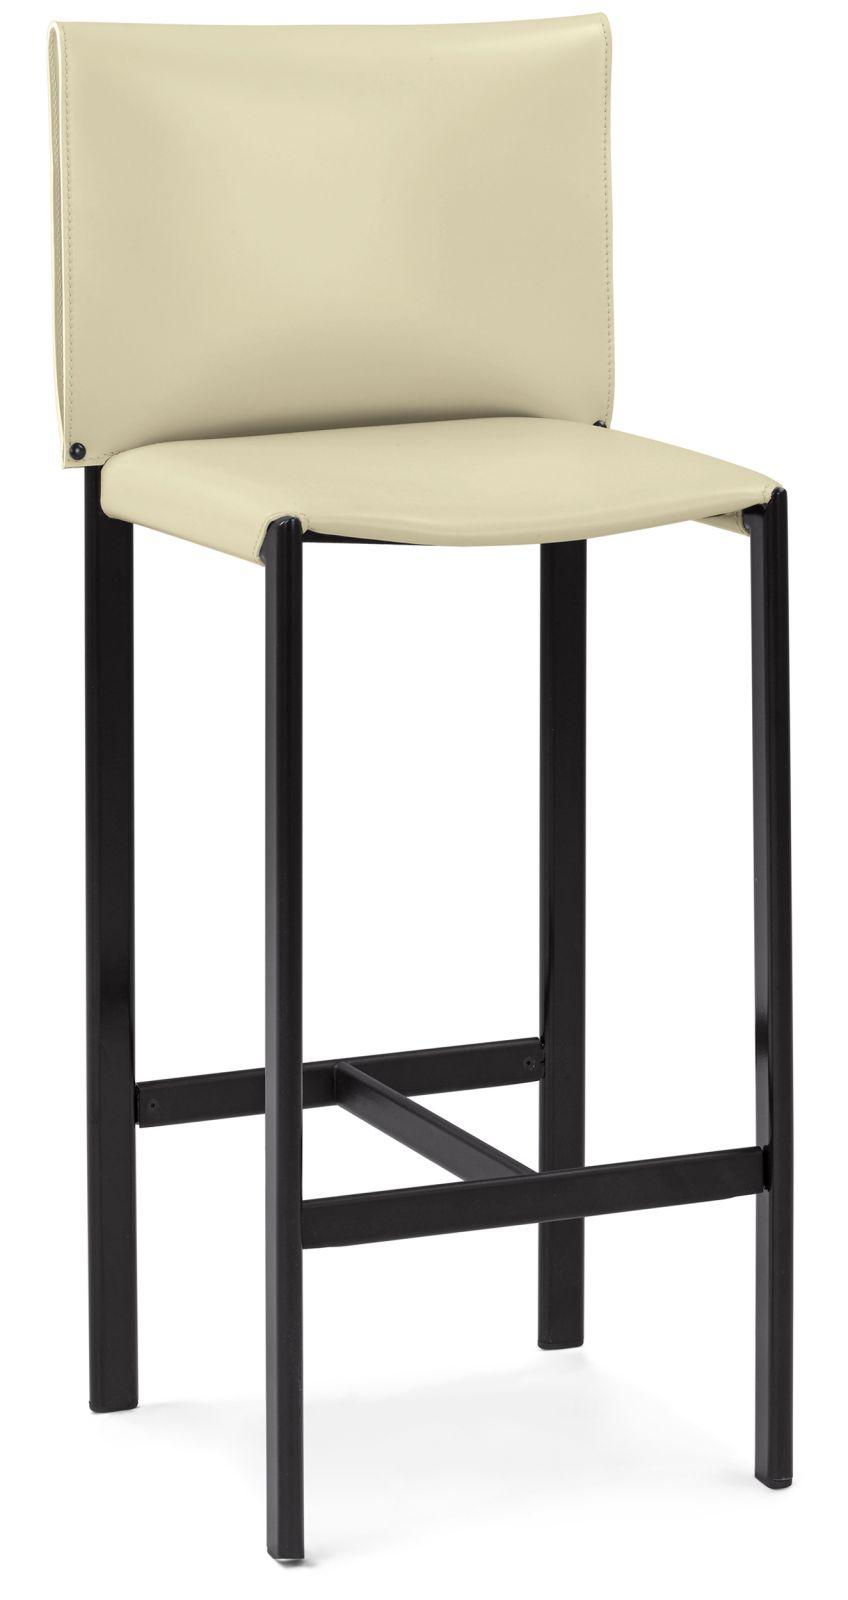 modern-bar-stools-Italian-furniture-large (25).jpg